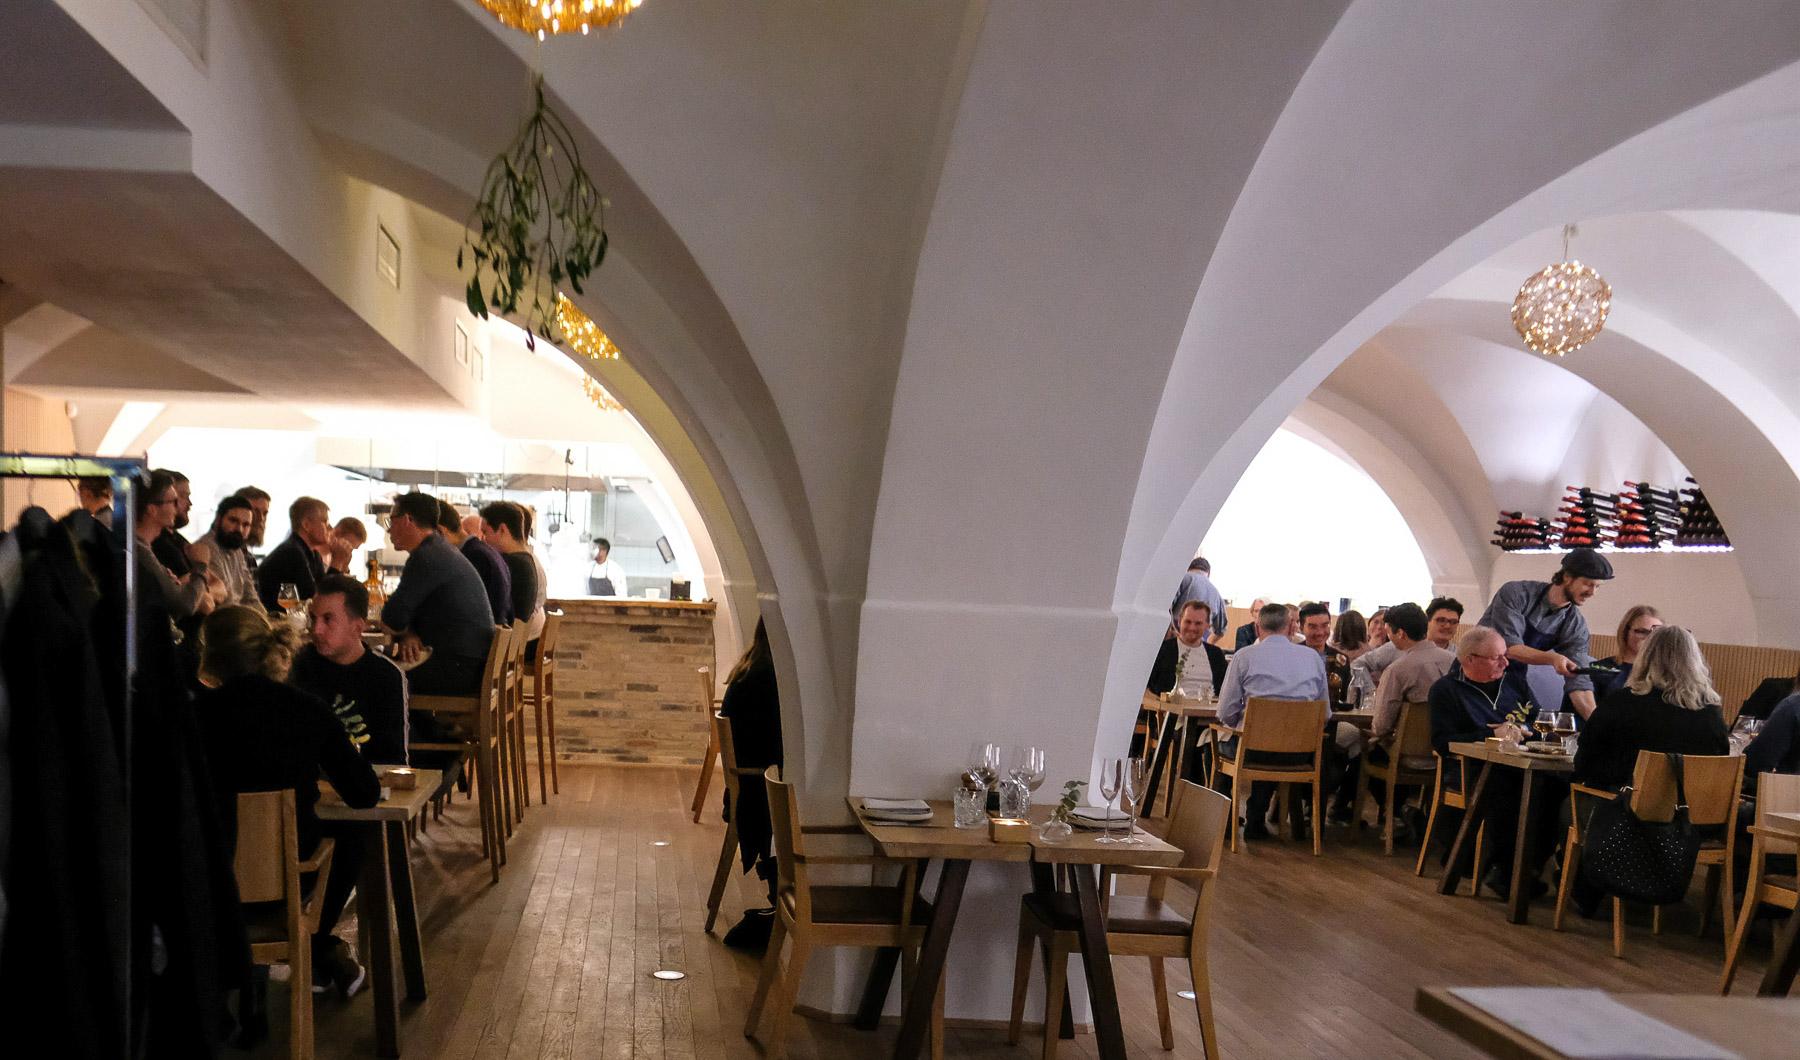 Nyhed på Malt: Lørdagsfrokosten i det gamle bryggeri